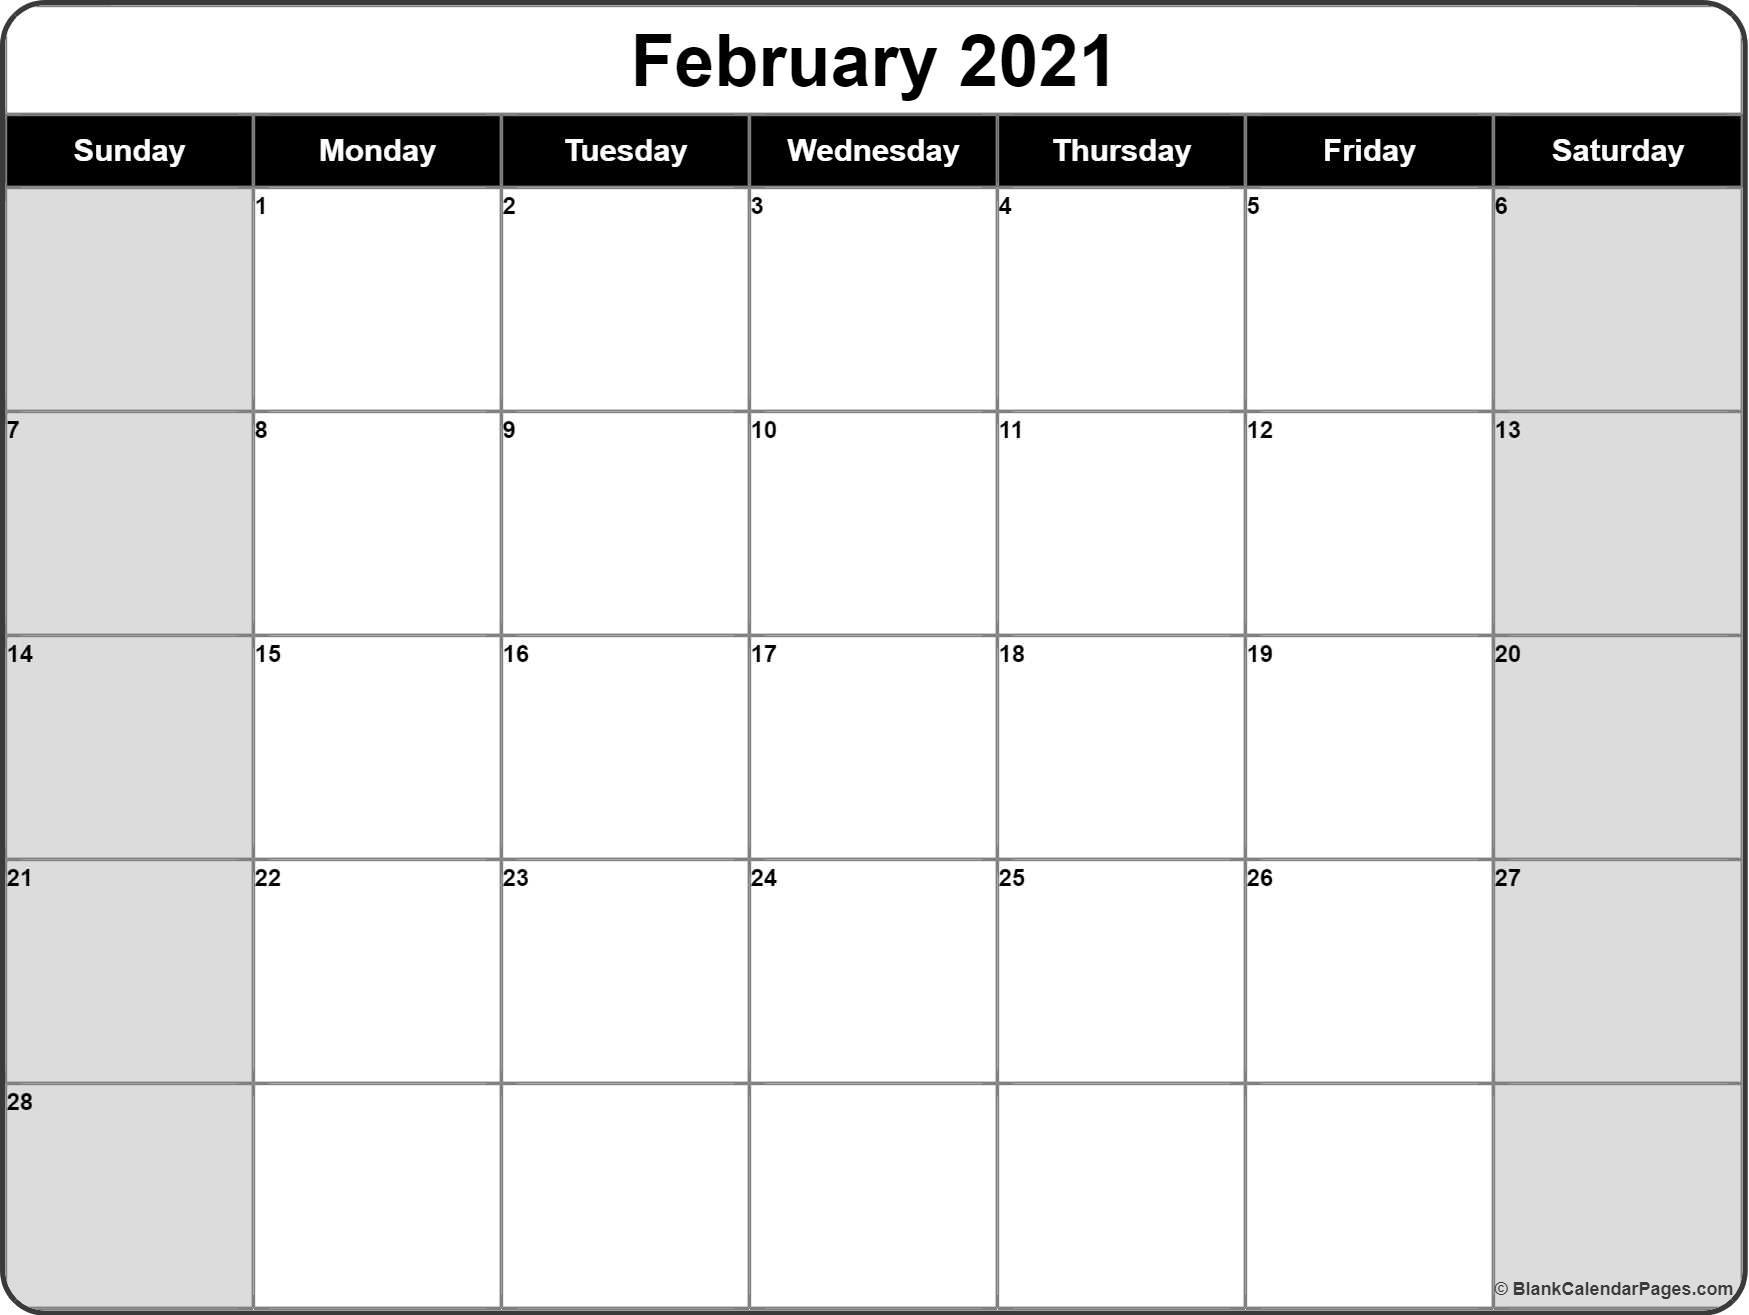 February 2021 Calendar Free Printable Monthly Calendars 3